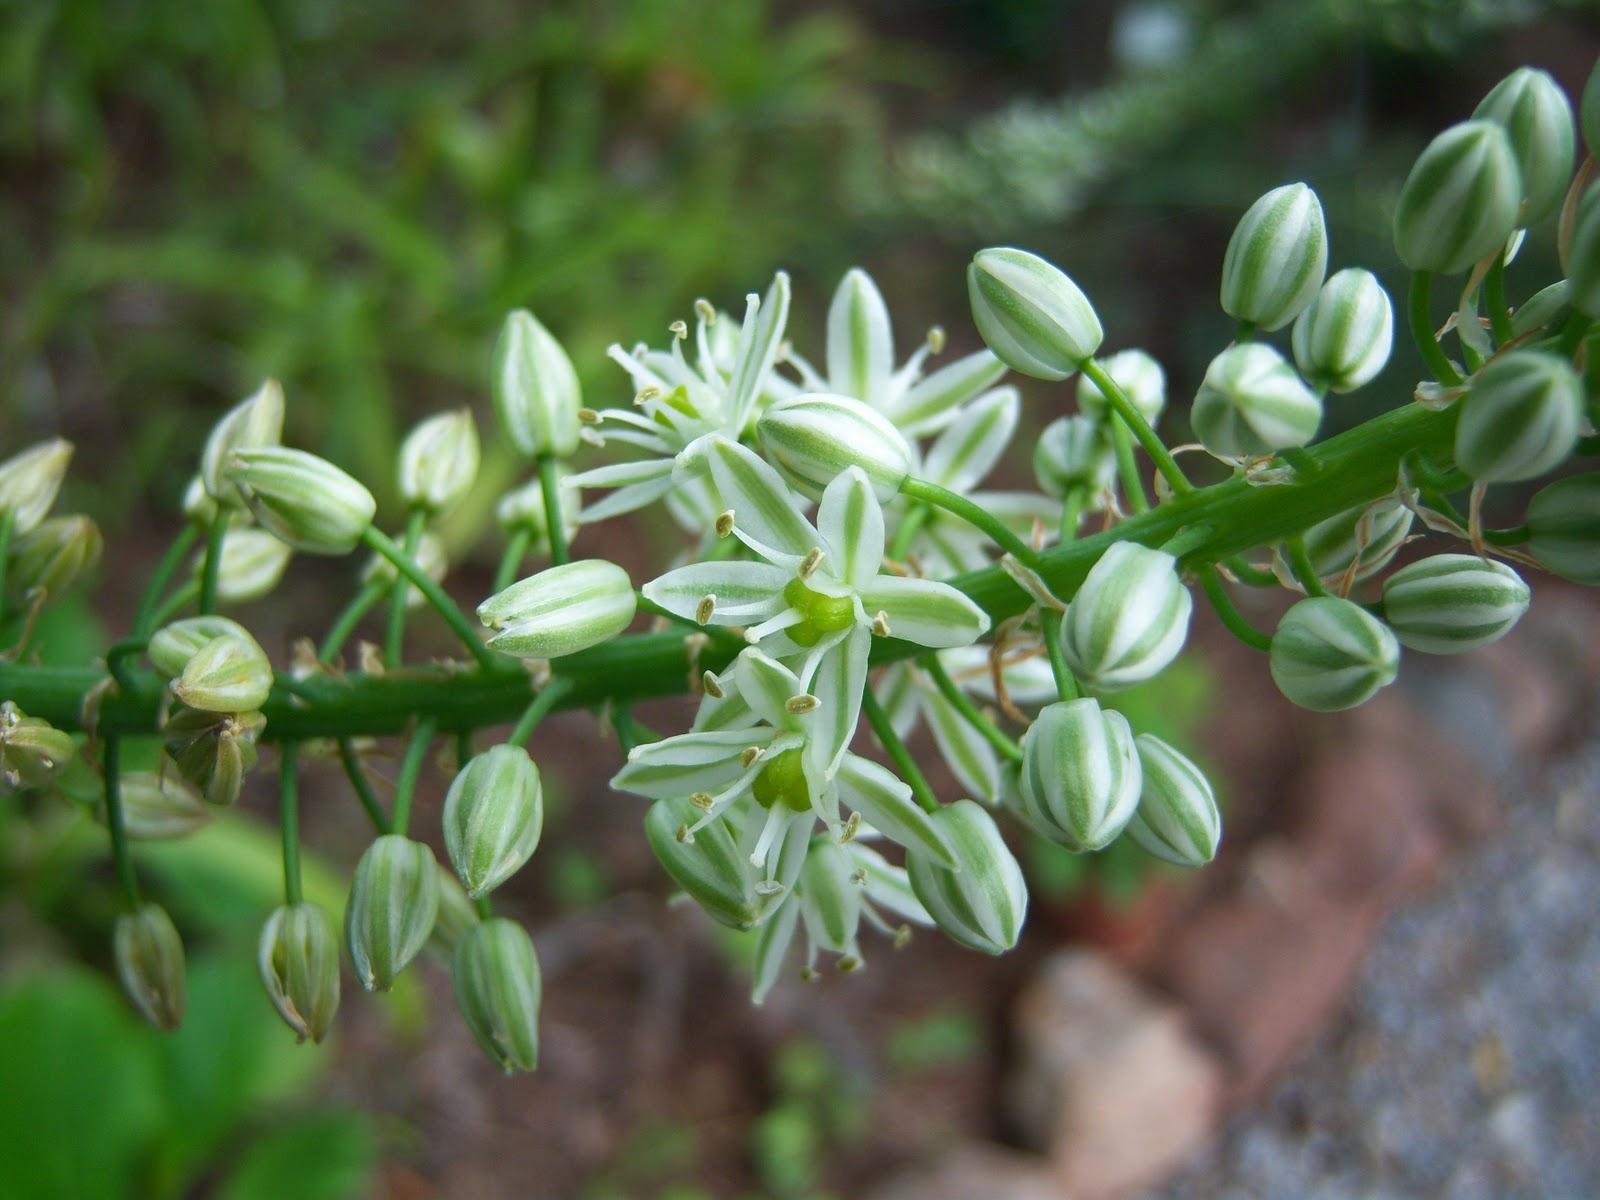 Baños Plantas Para Buena Suerte:Foto Botanic Serrat : Cebolla de la suerte (Ornithogalum caudatum)